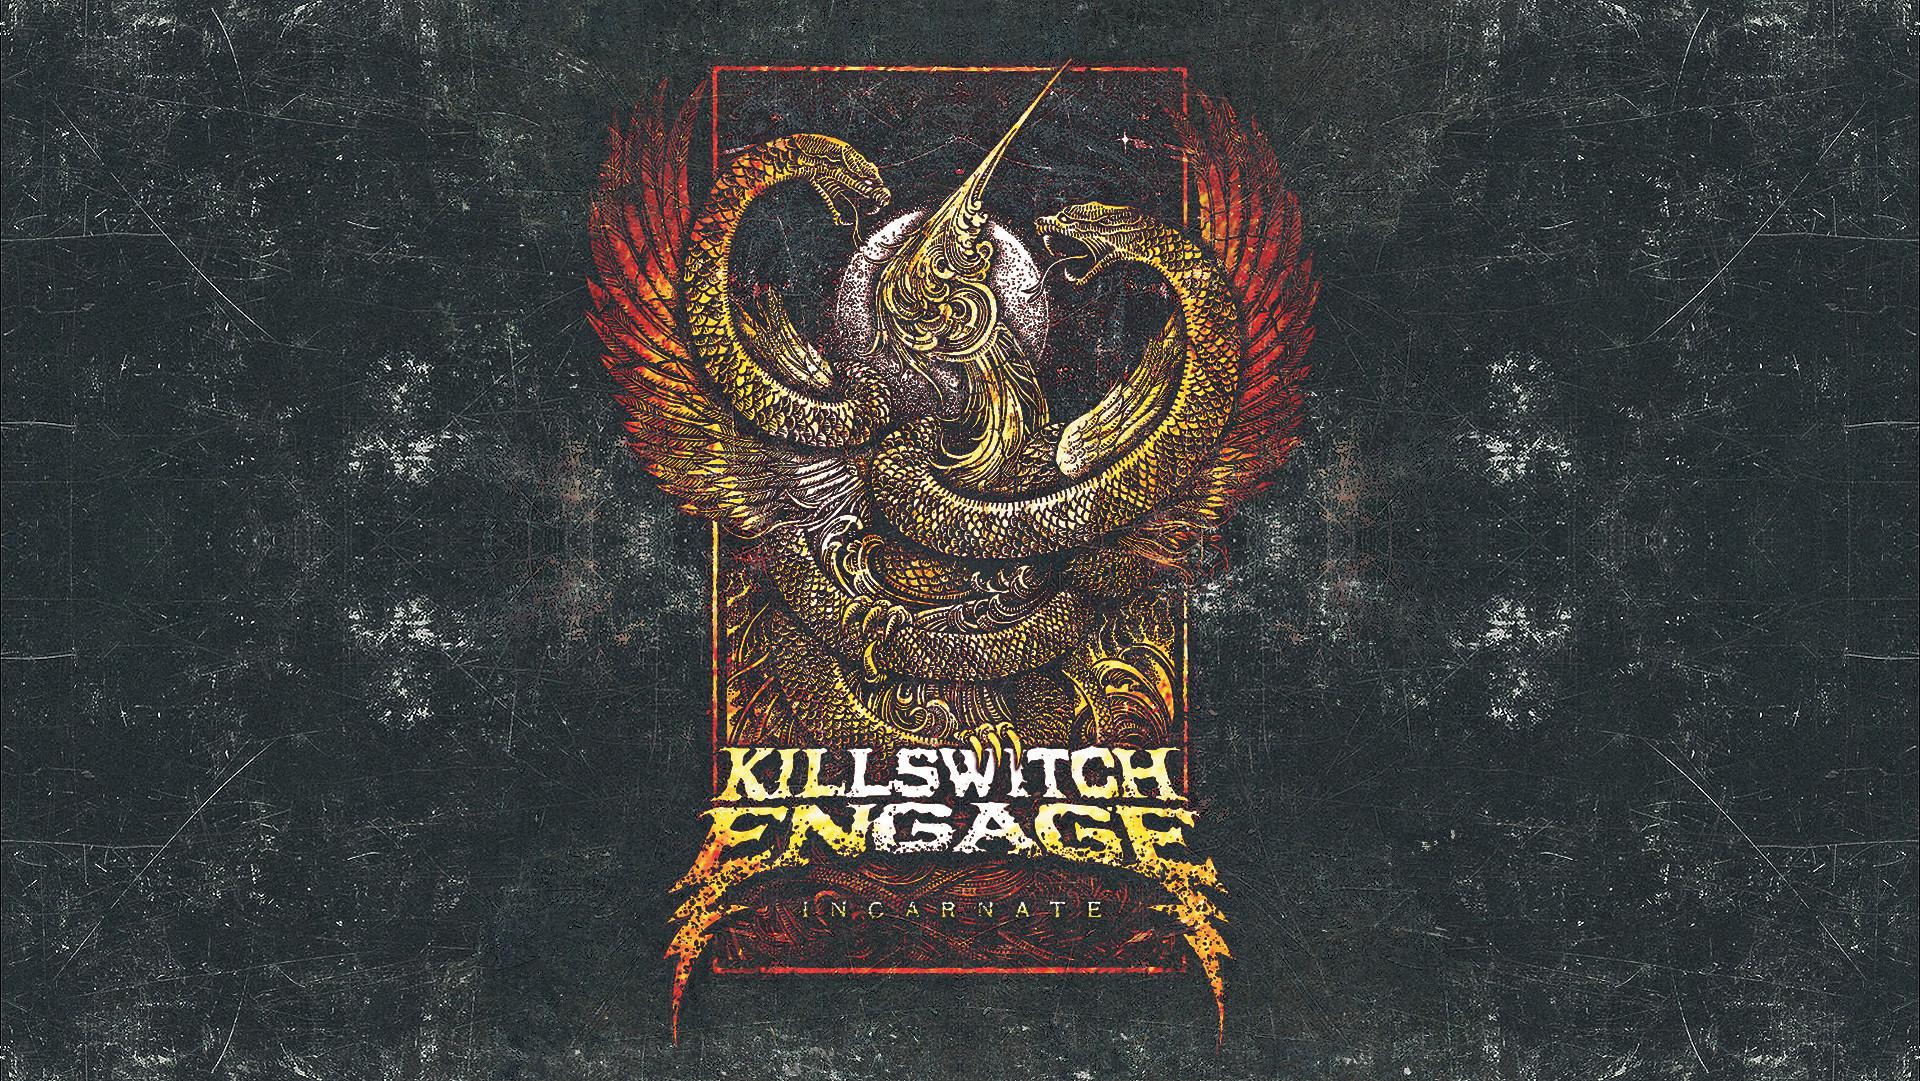 Killswitch Engage Incarnate